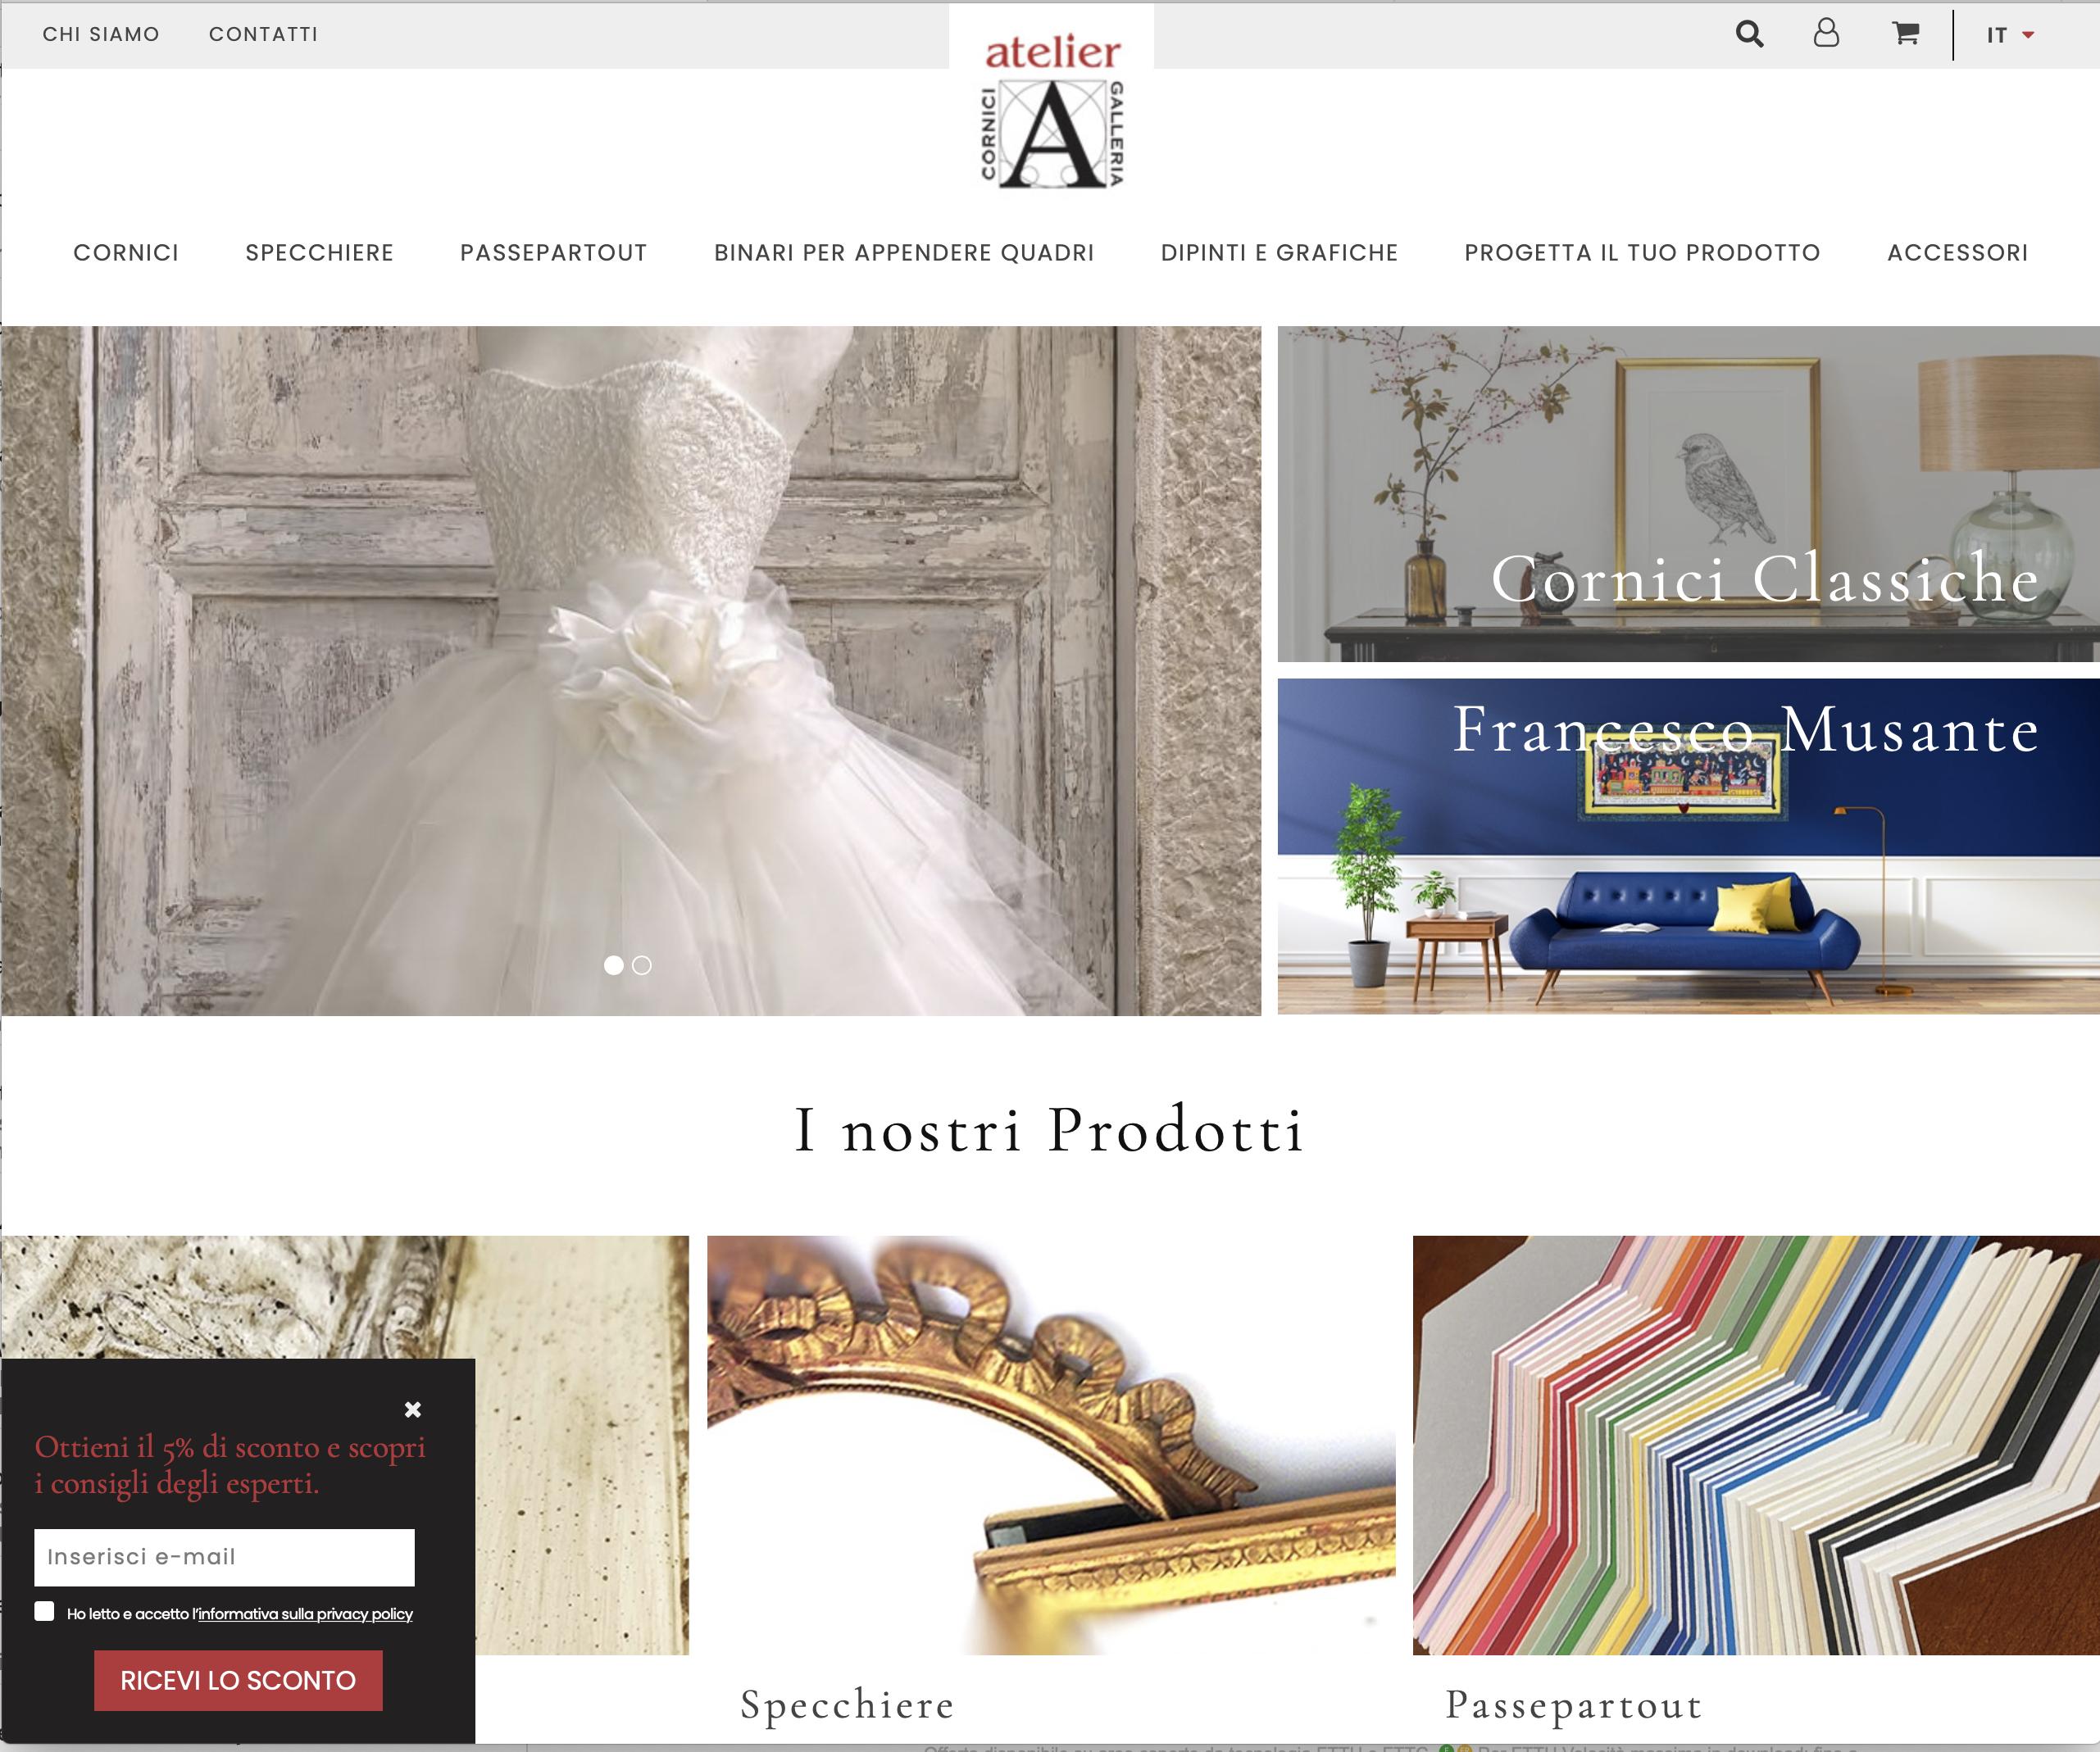 Online il nuovo Atelieronline.it!